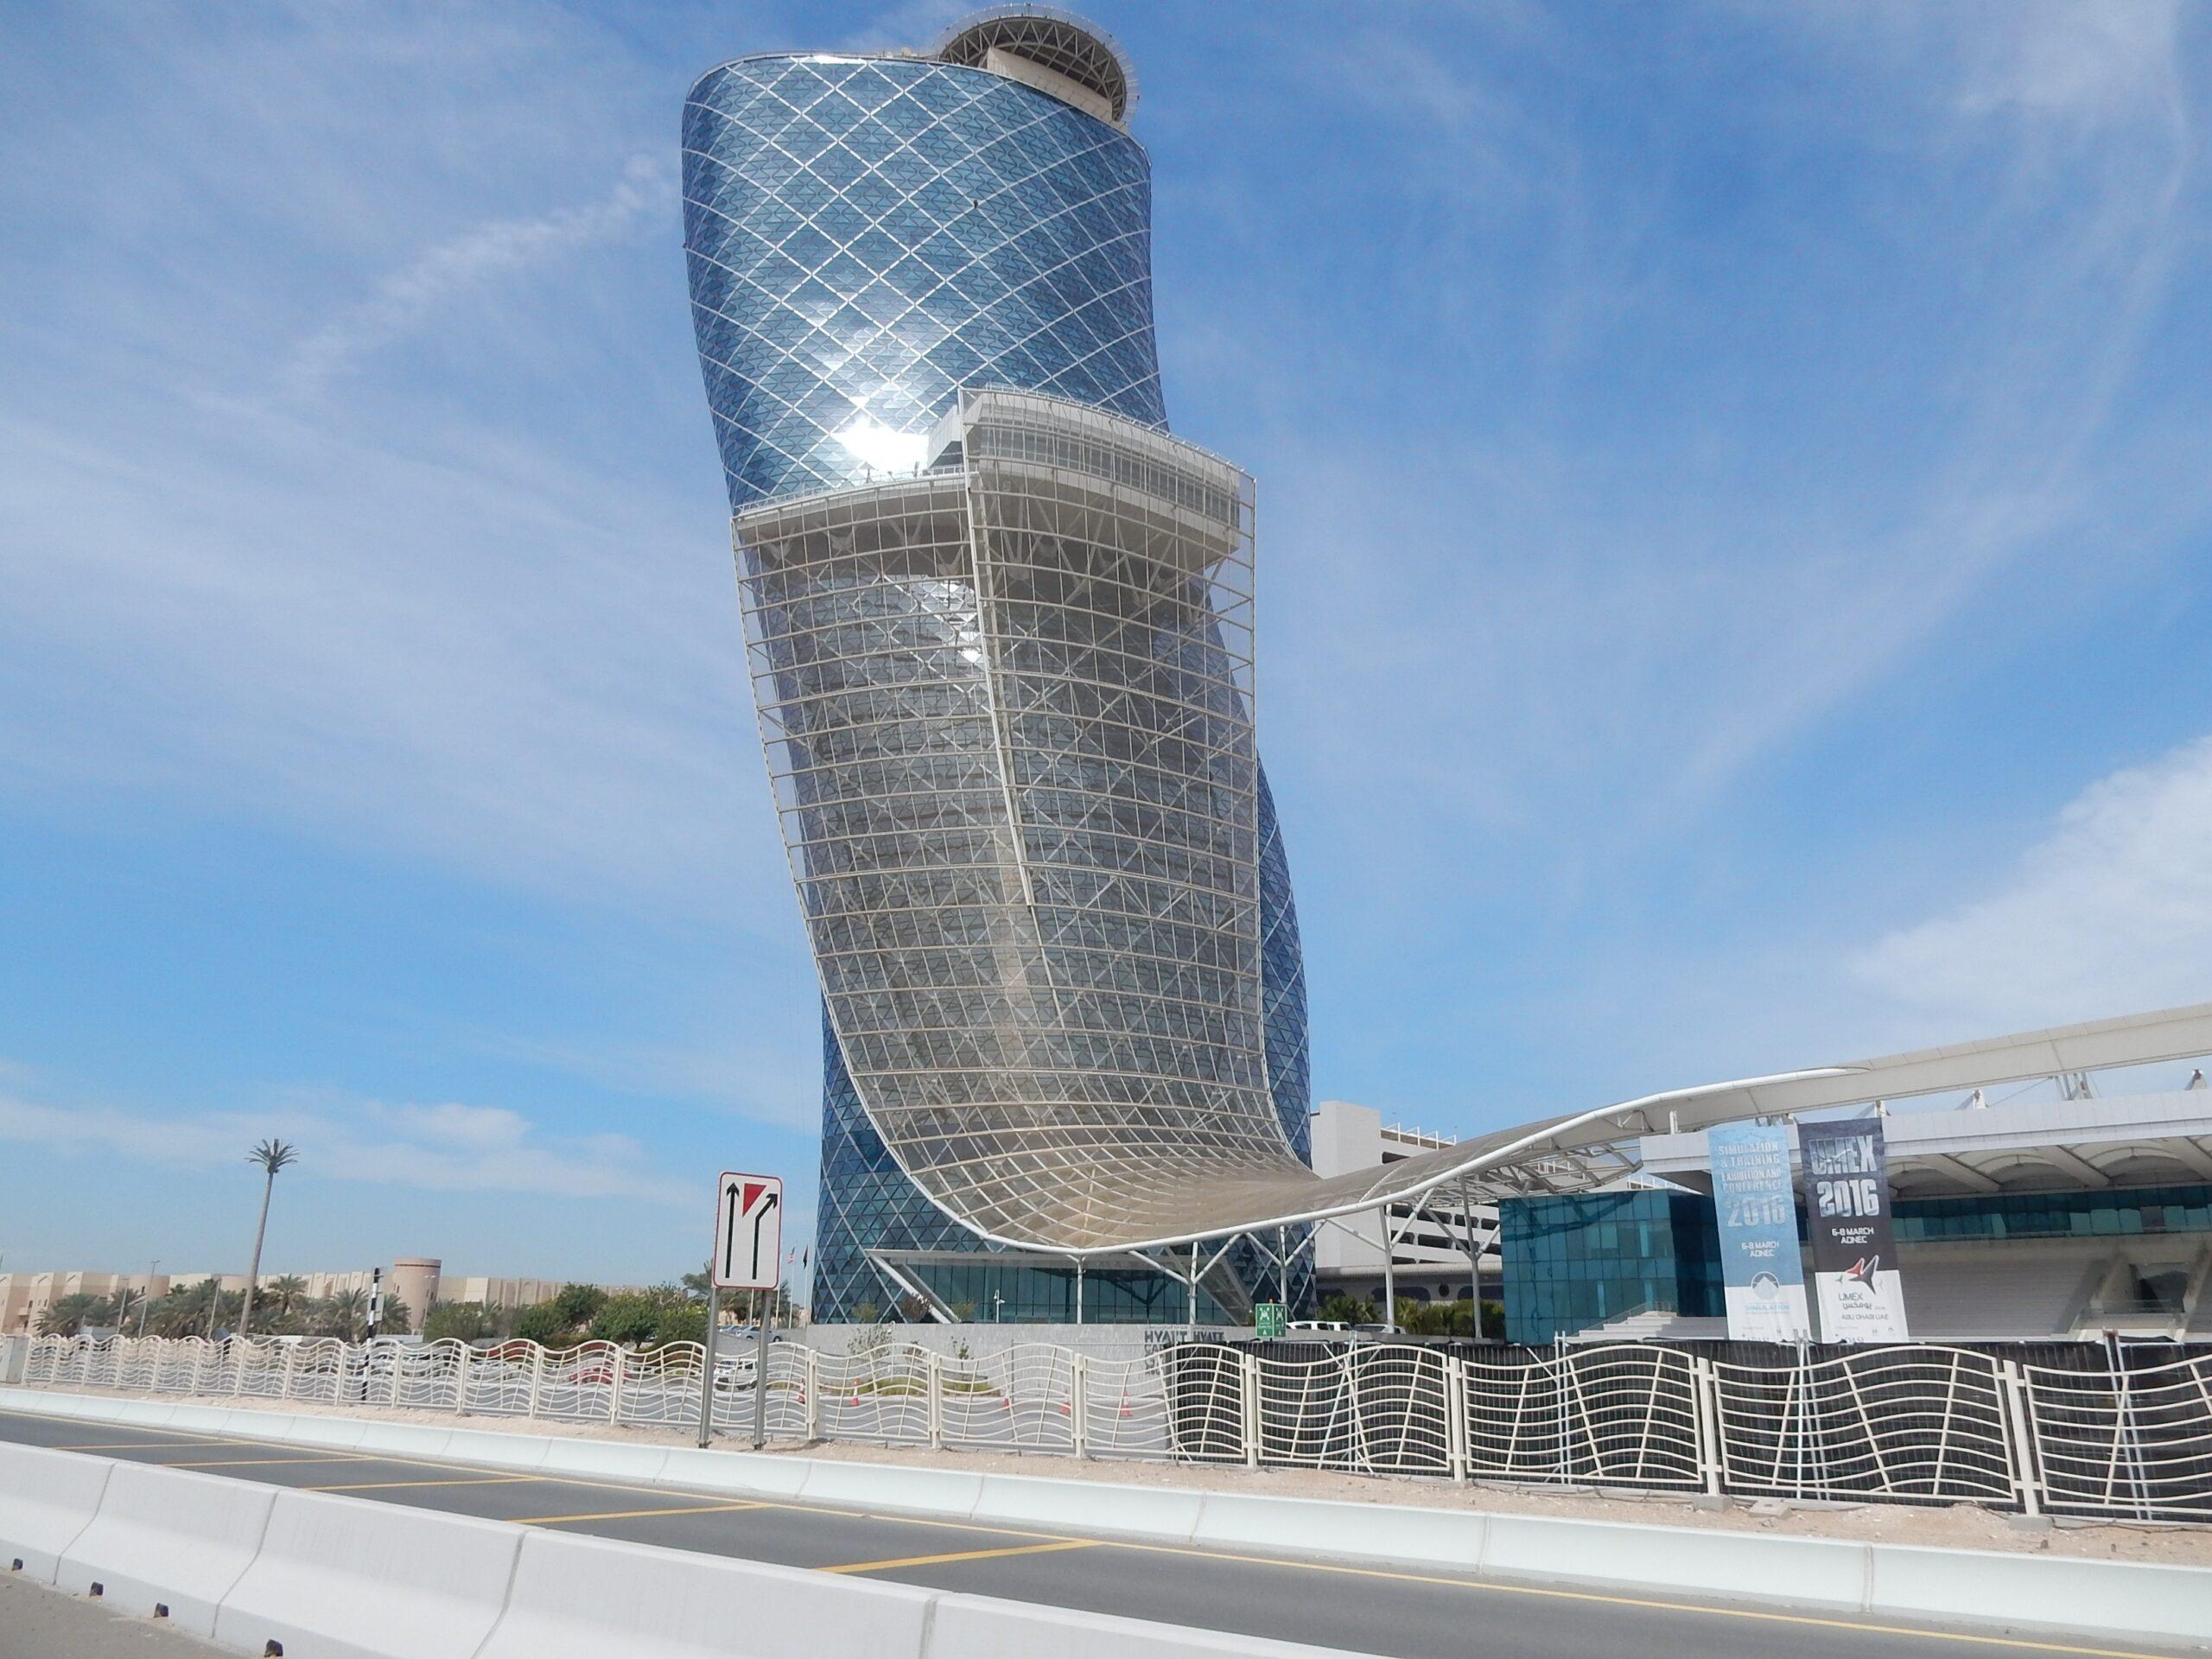 Das Tor zu Abu Dhabi - Capital Gate